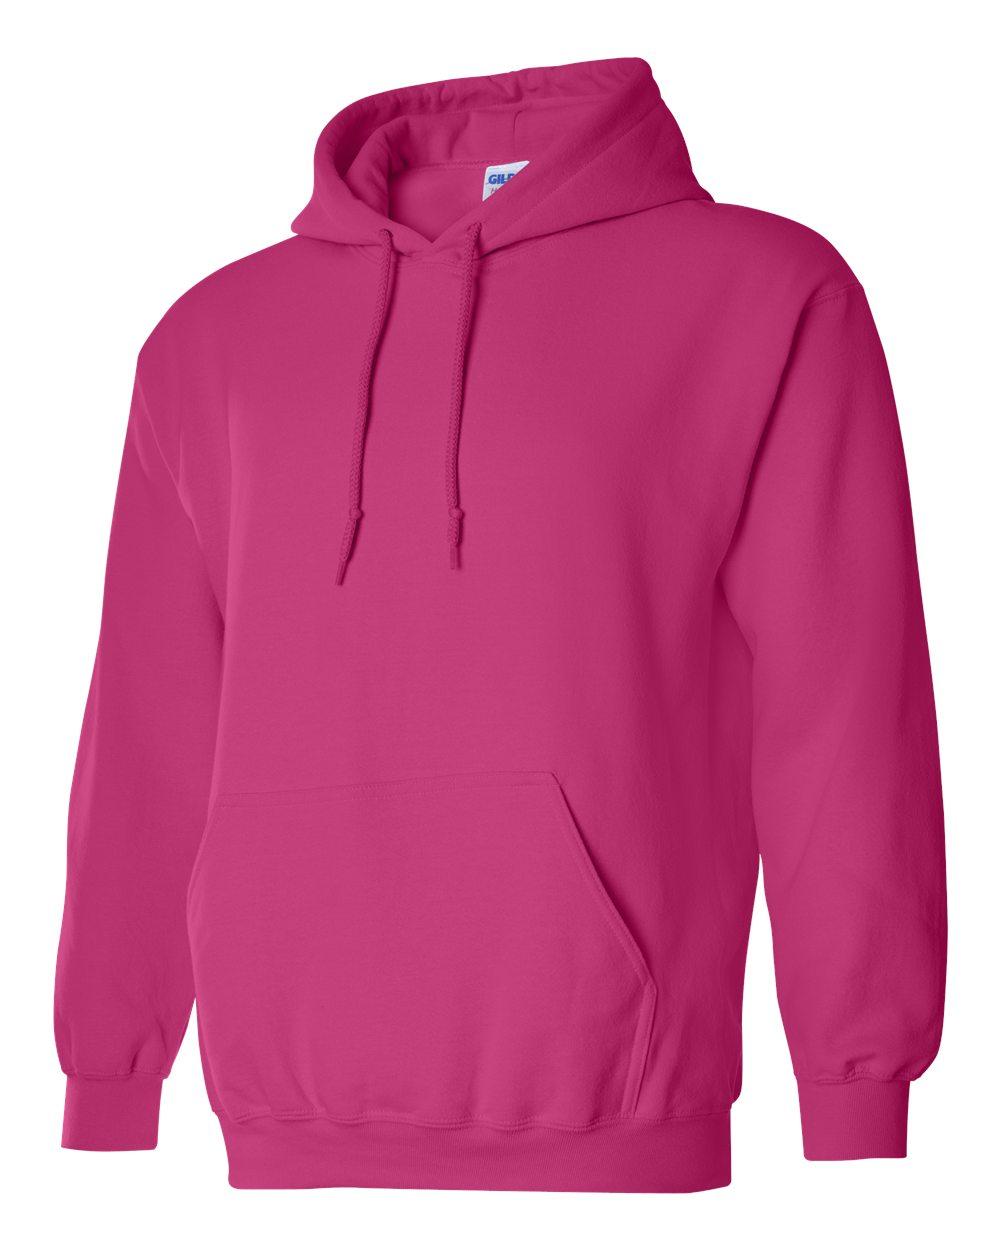 Gildan Heavy Blend Hooded Sweatshirt GI18500 Helconia